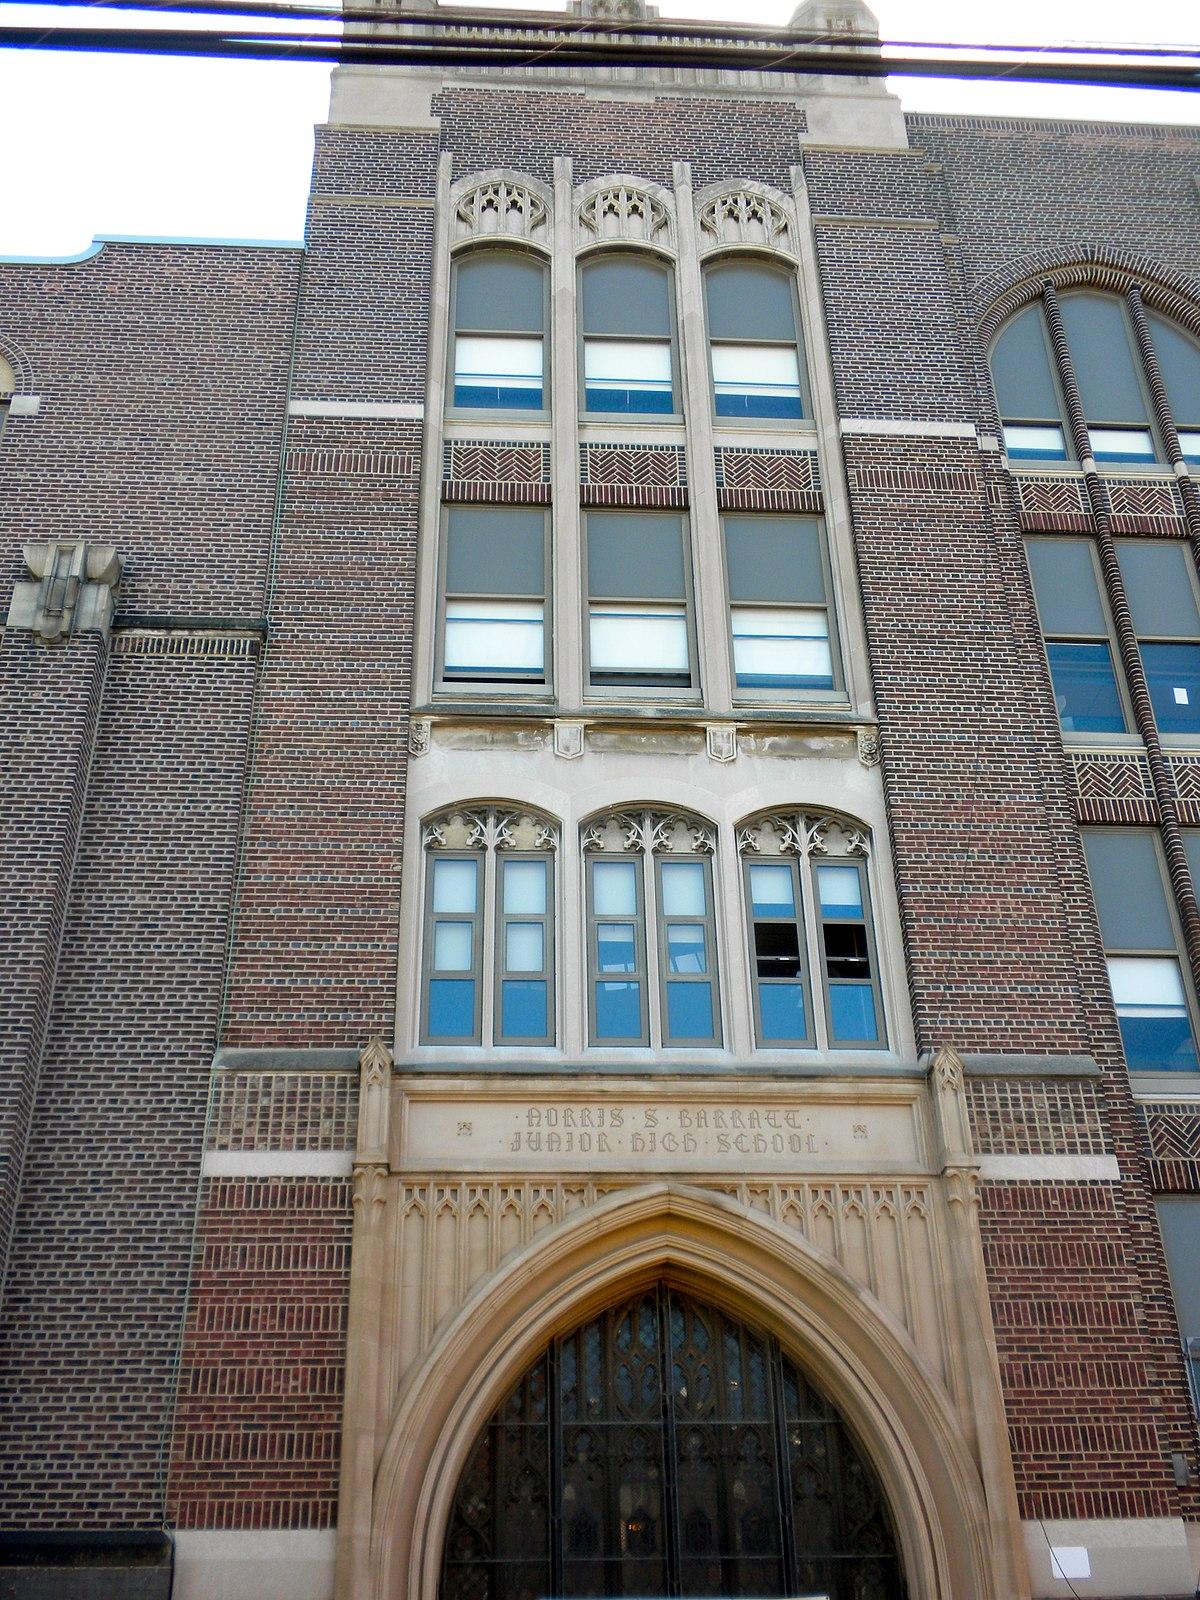 G.W. Childs Elementary School - Wikipedia